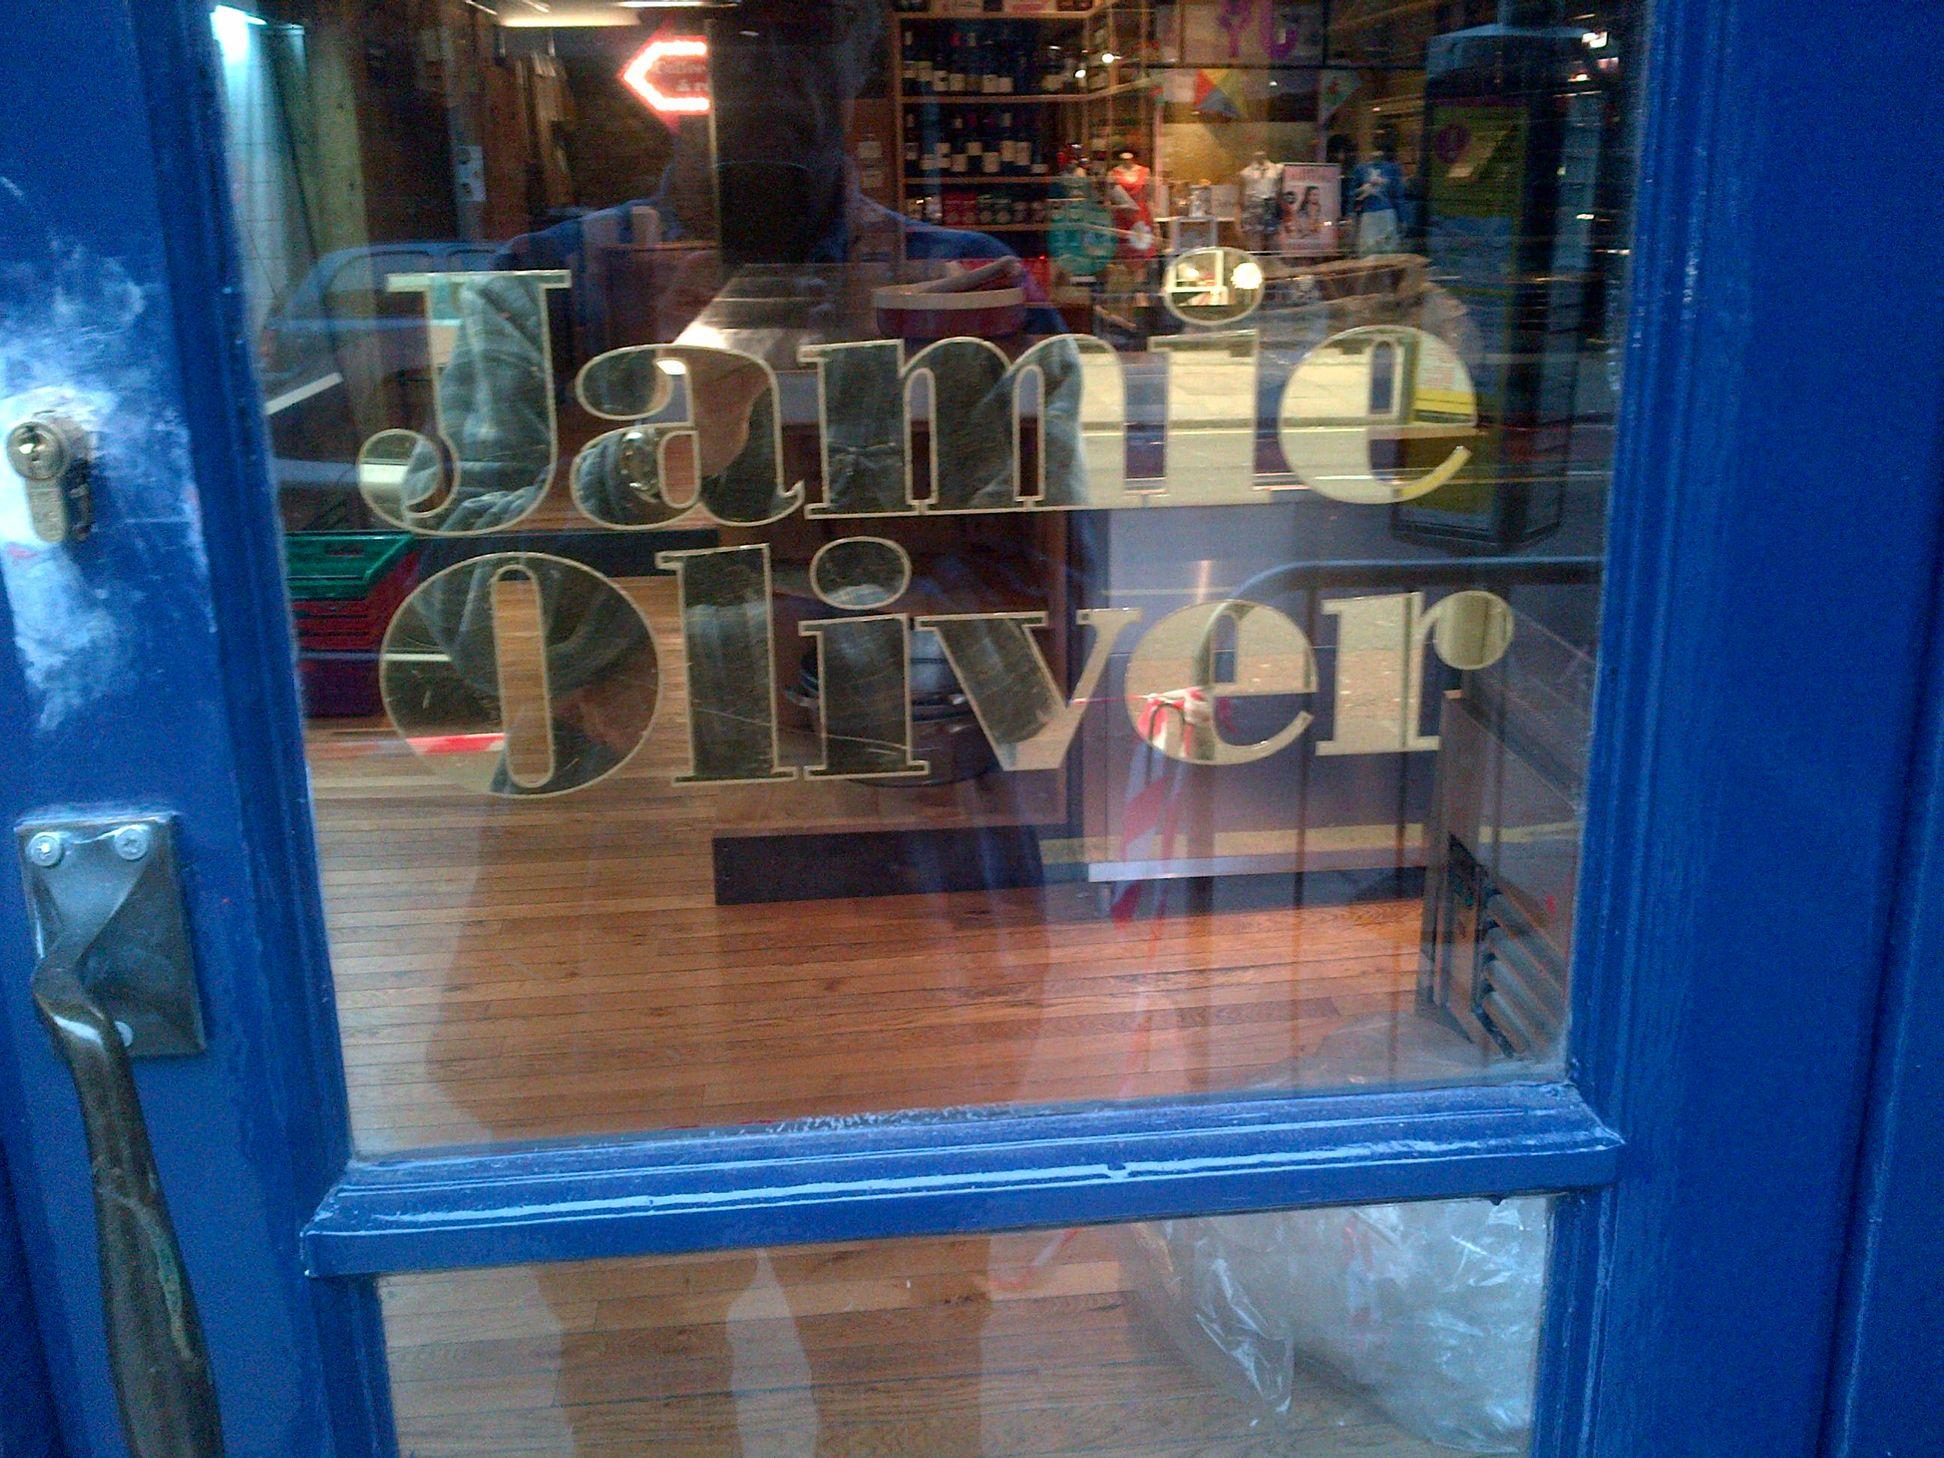 Jamies Italian, London 2013